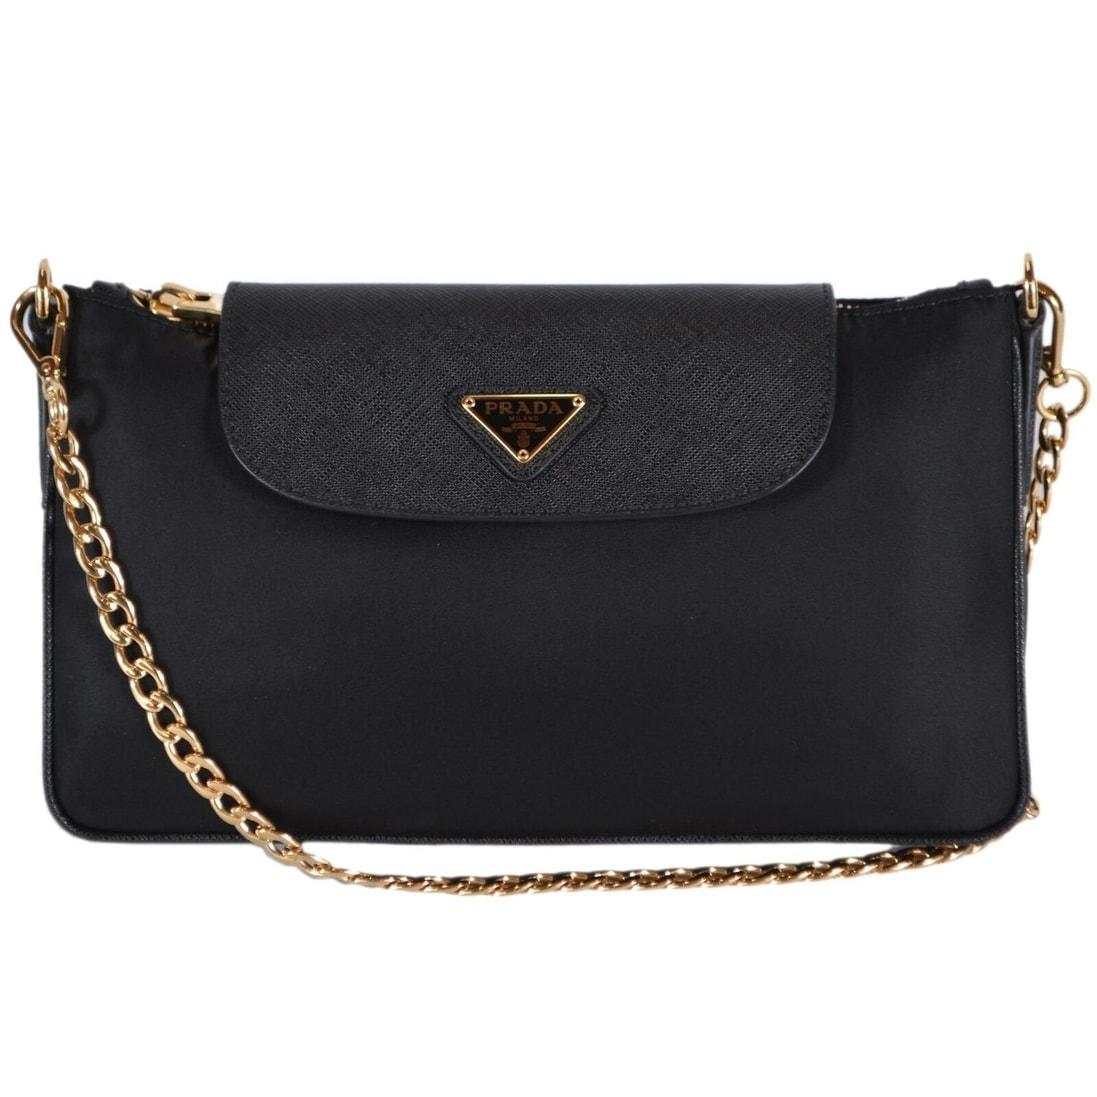 ce1c4e13046a Prada 1BG085 Black Nylon Leather Bandoliera Chain Crossbody Purse Bag